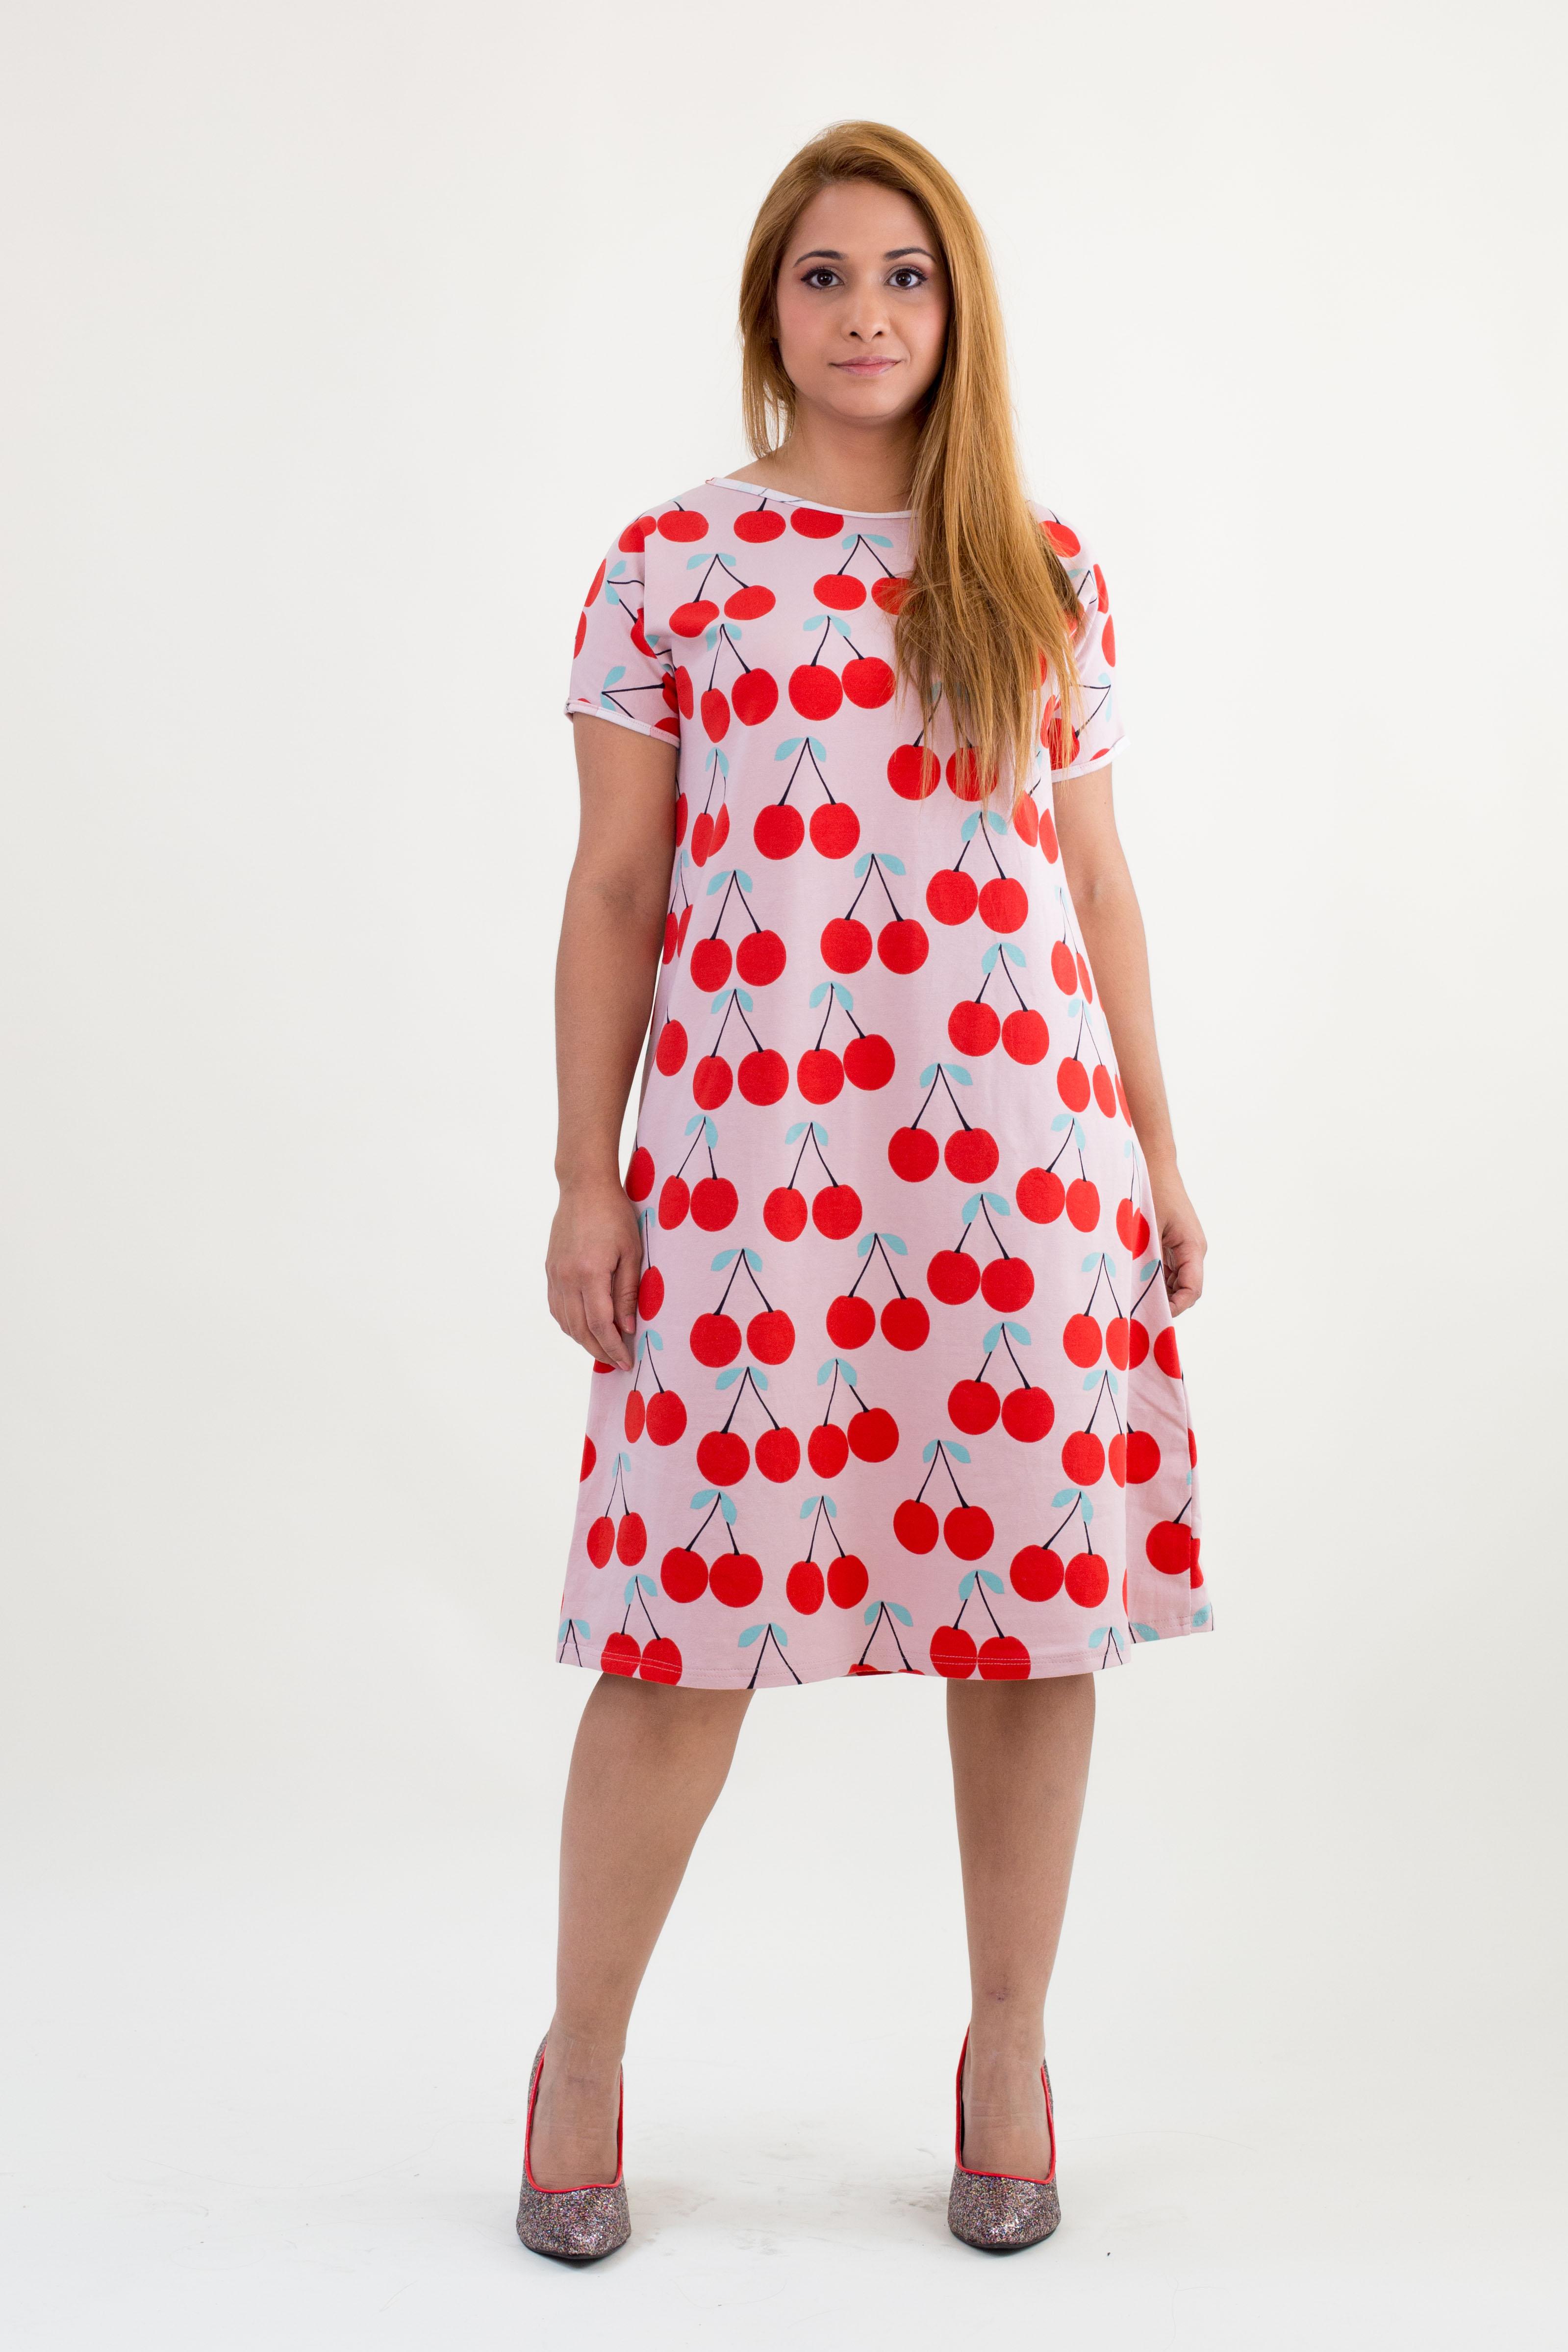 skandimama karoline hughes cherrydress